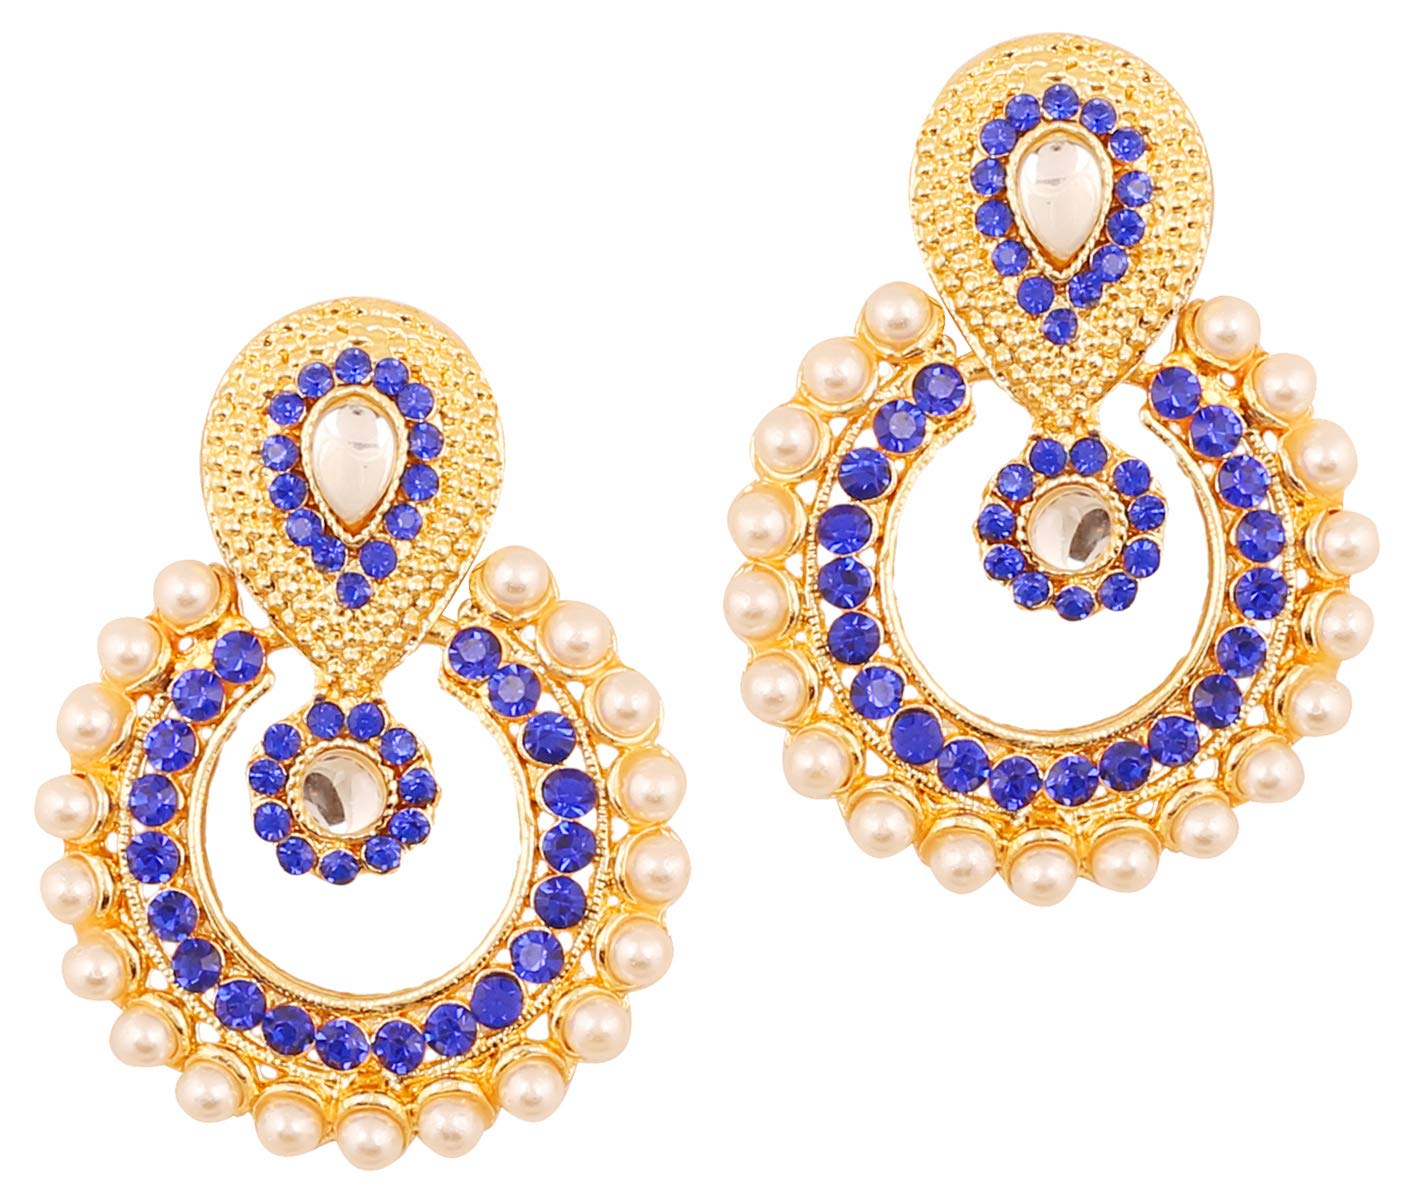 Touchstone Indian Bollywood Chandbali Moon Kundan polki Faux Pearls and Blue Sapphire Rhinestone Long Bridal Designer Jewelry Chandelier Earrings for Women in Gold Tone